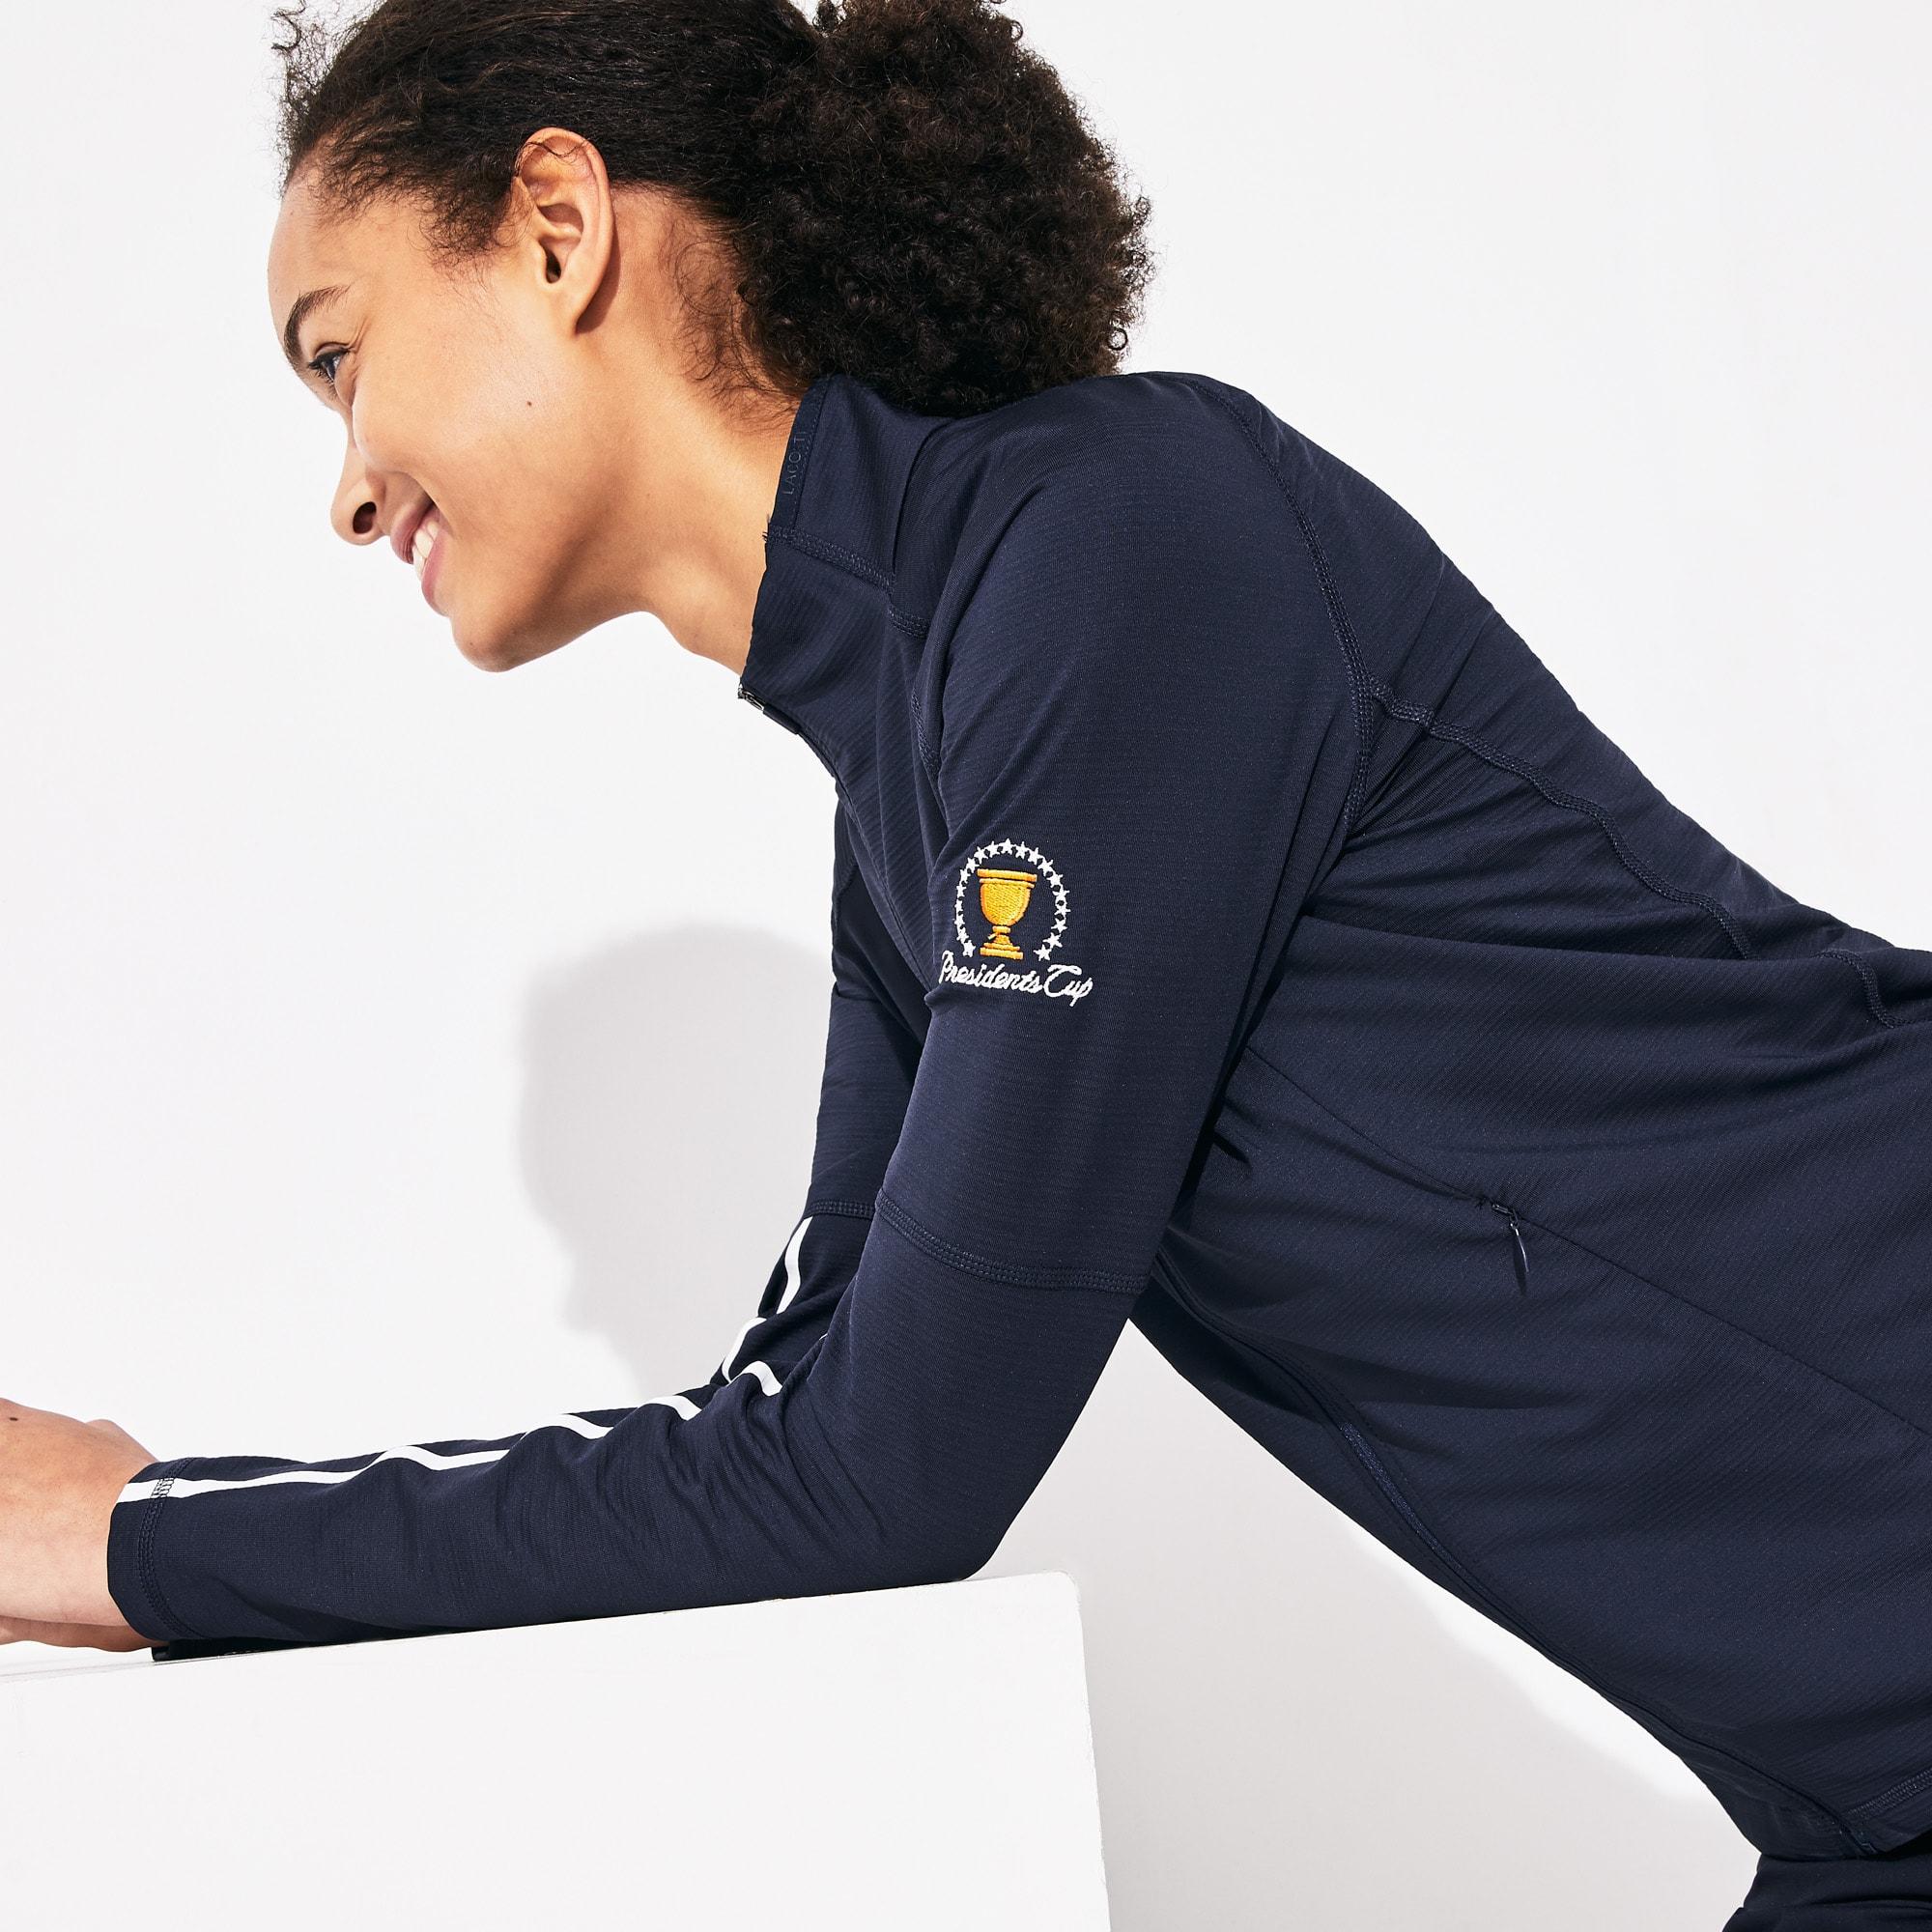 Lacoste Tops Women's Presidents Cup Breathable Stretch Zip Golf Sweatshirt